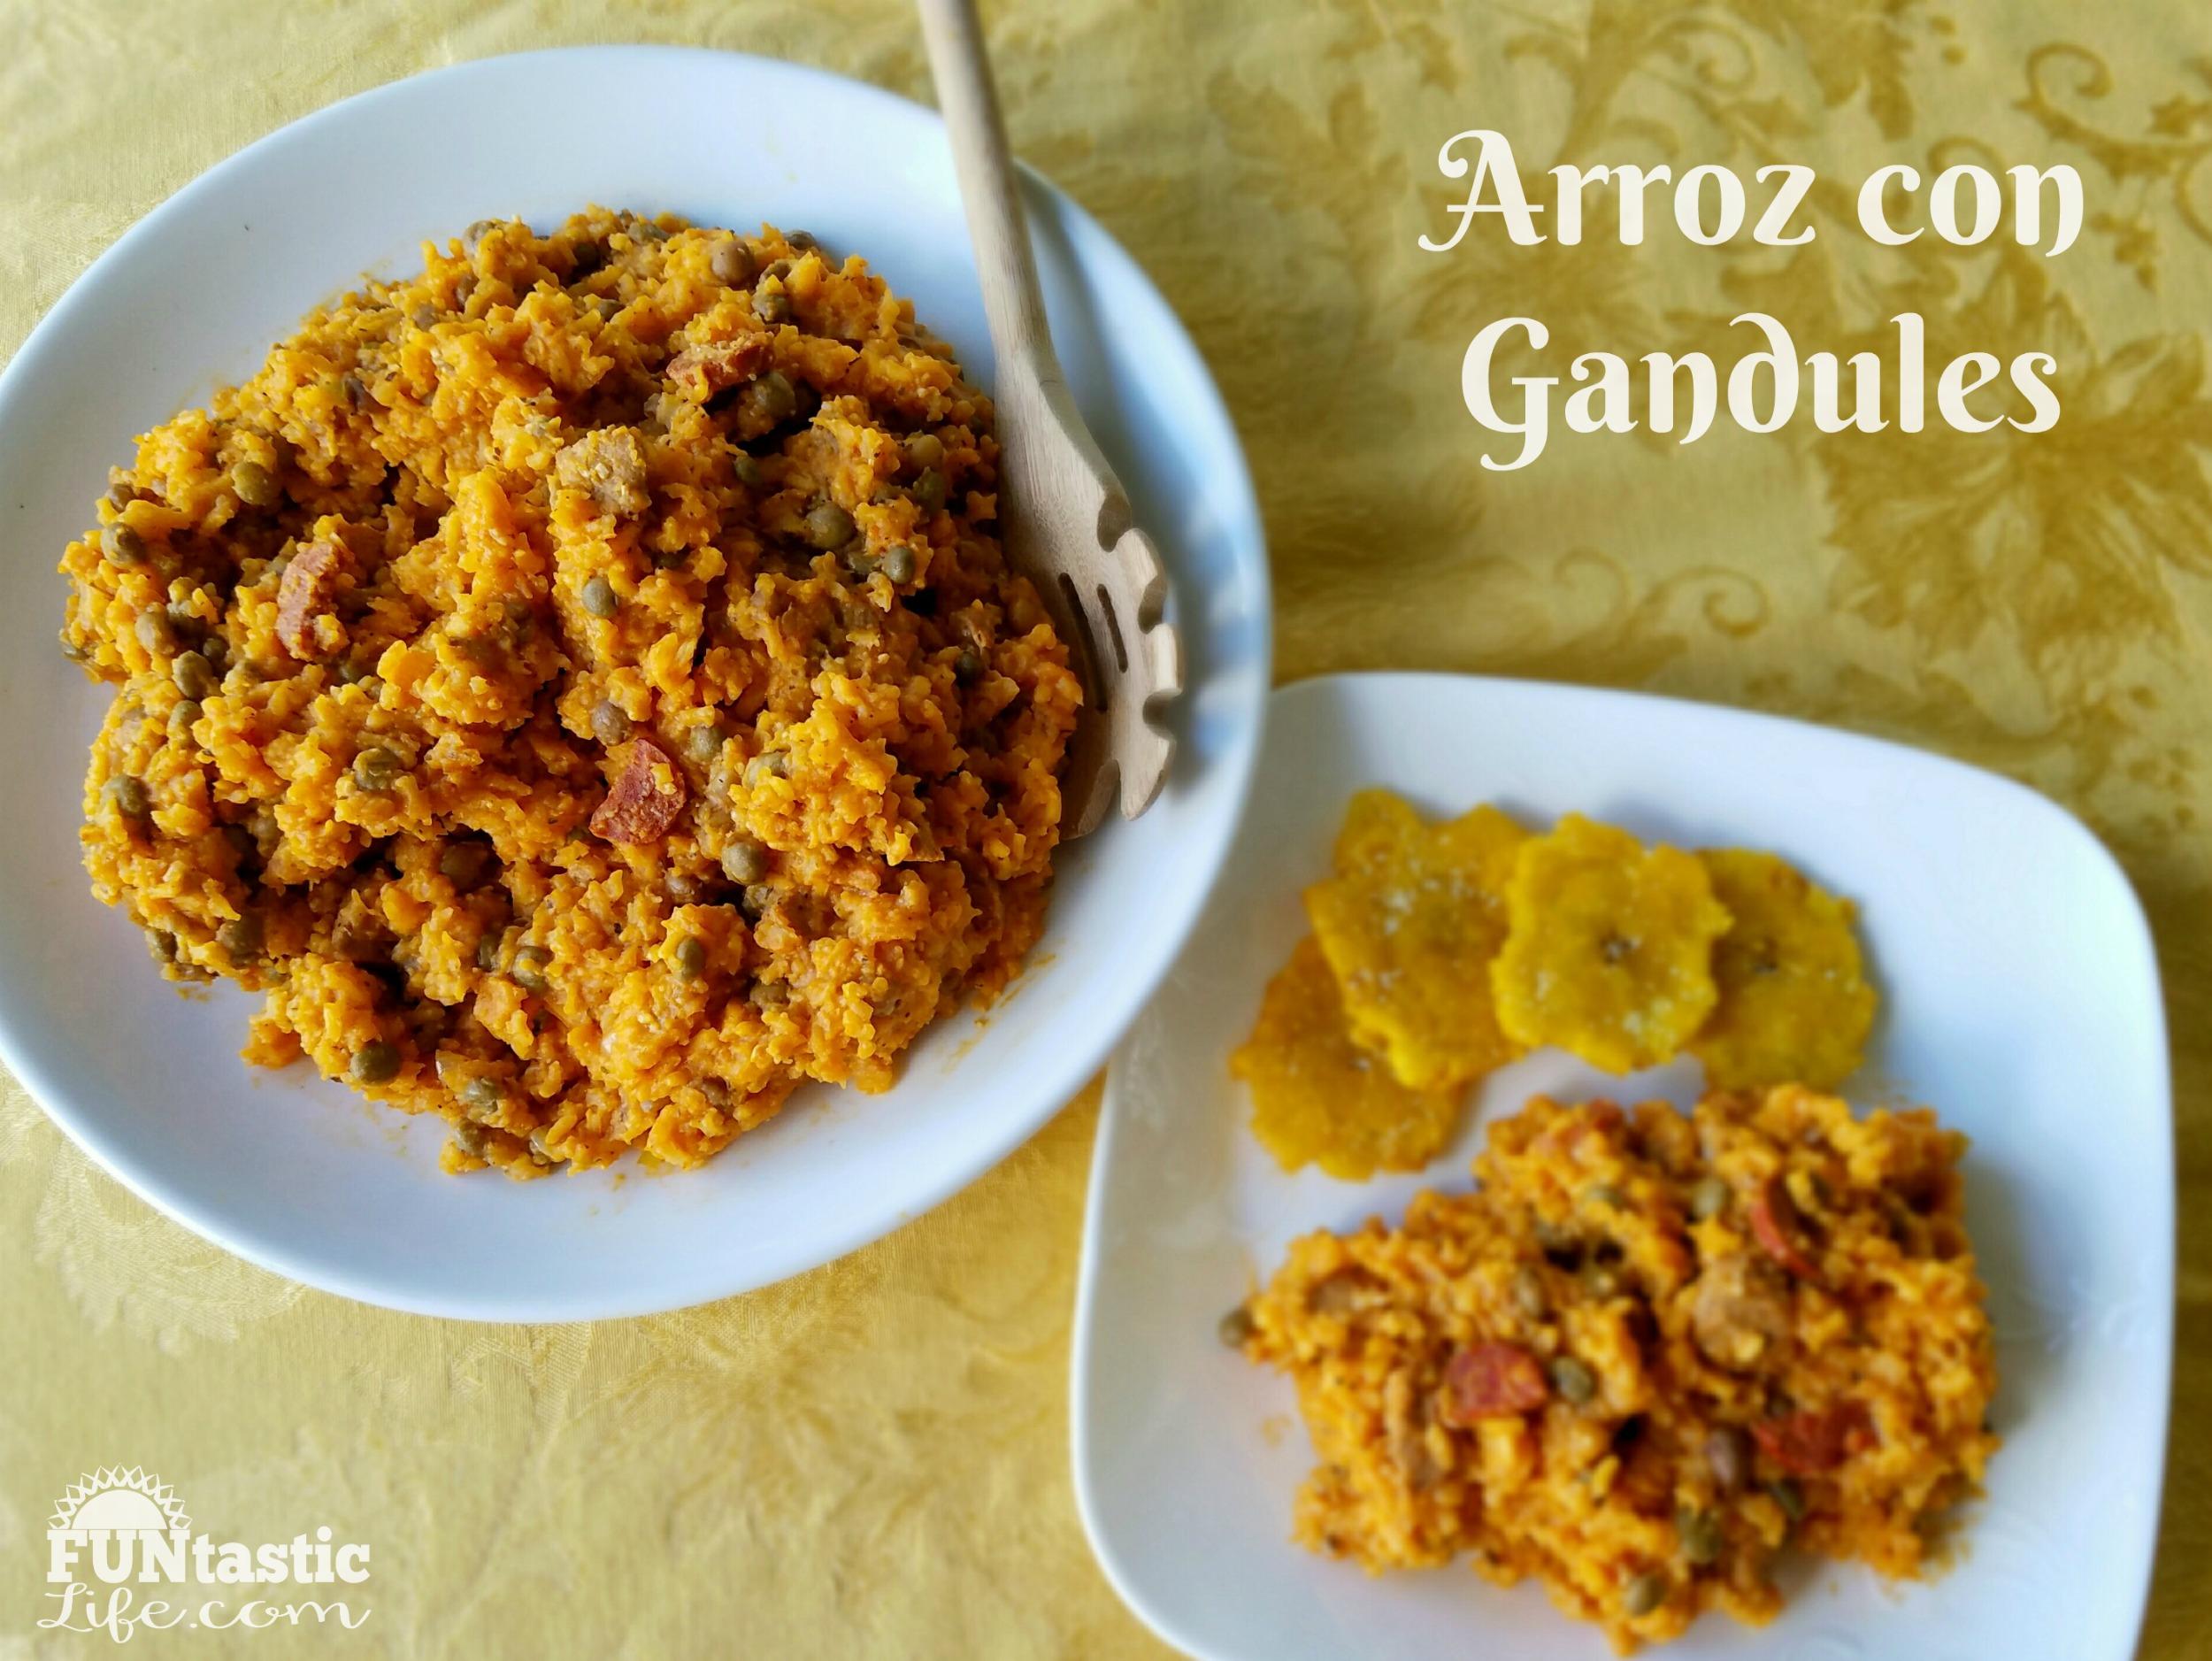 Arroz Con Gandules Recipe (Rice and Pigeon Peas ...